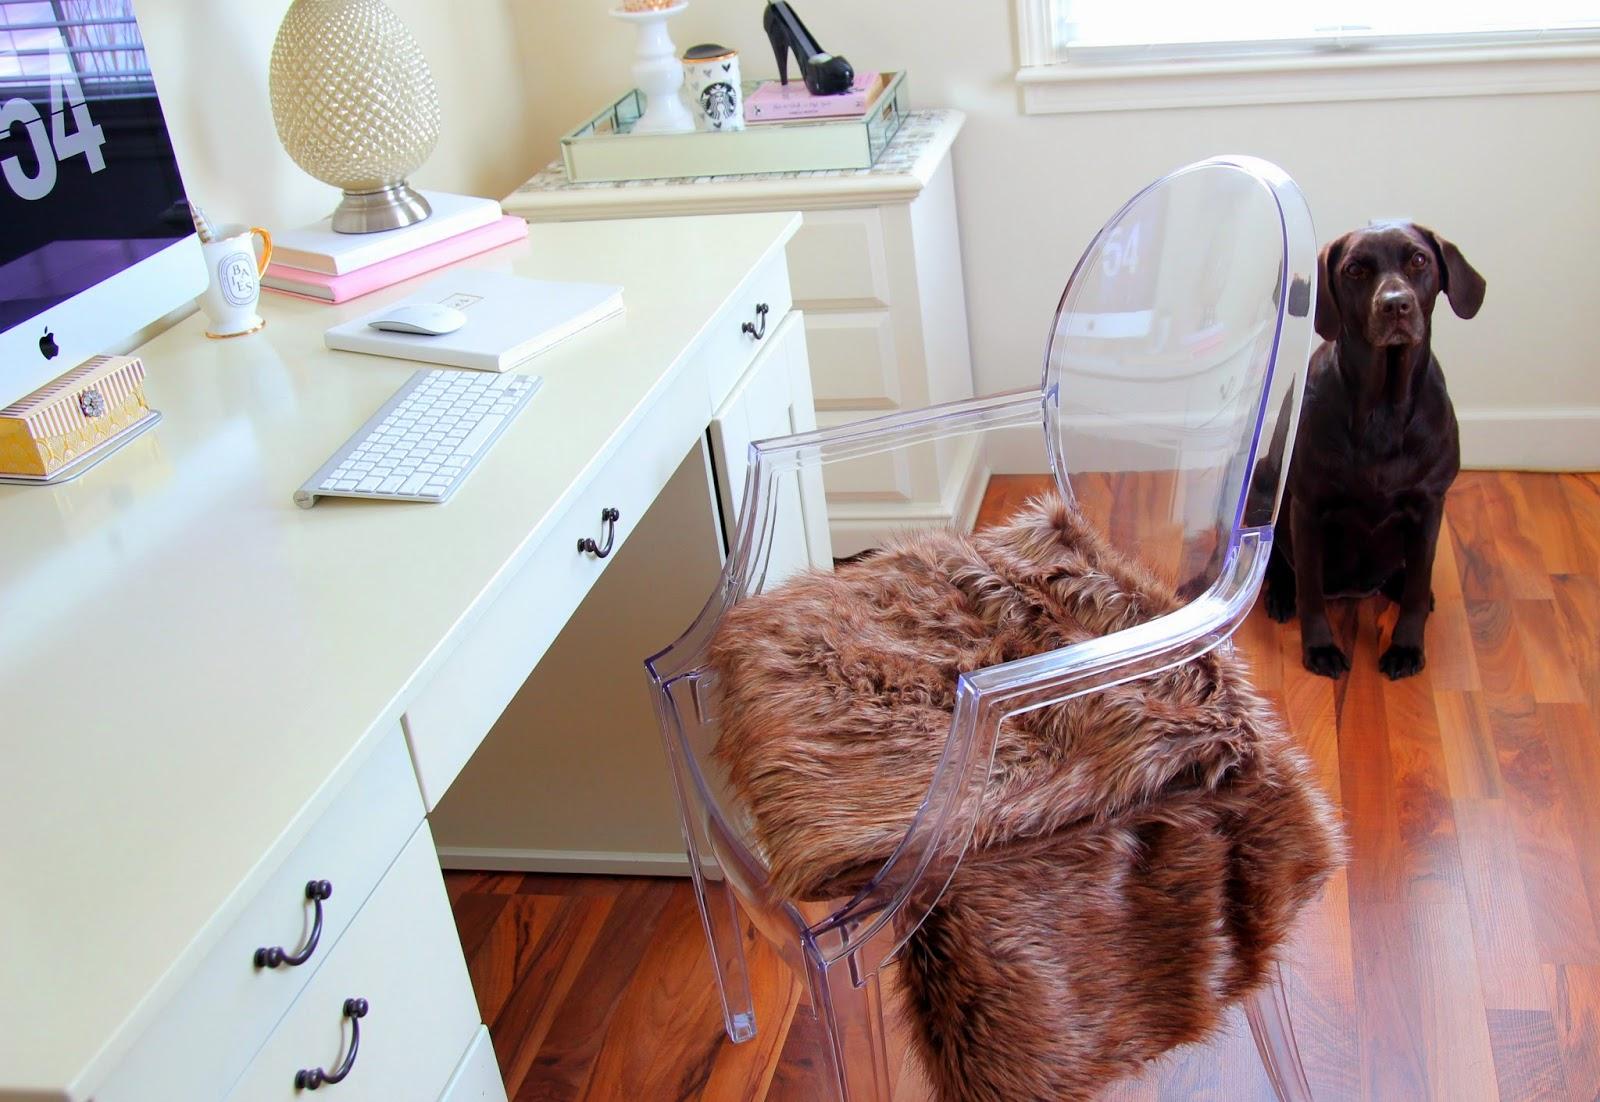 Desk Tour - Desk Organization - Girly Office - Girly Decor - Home Office